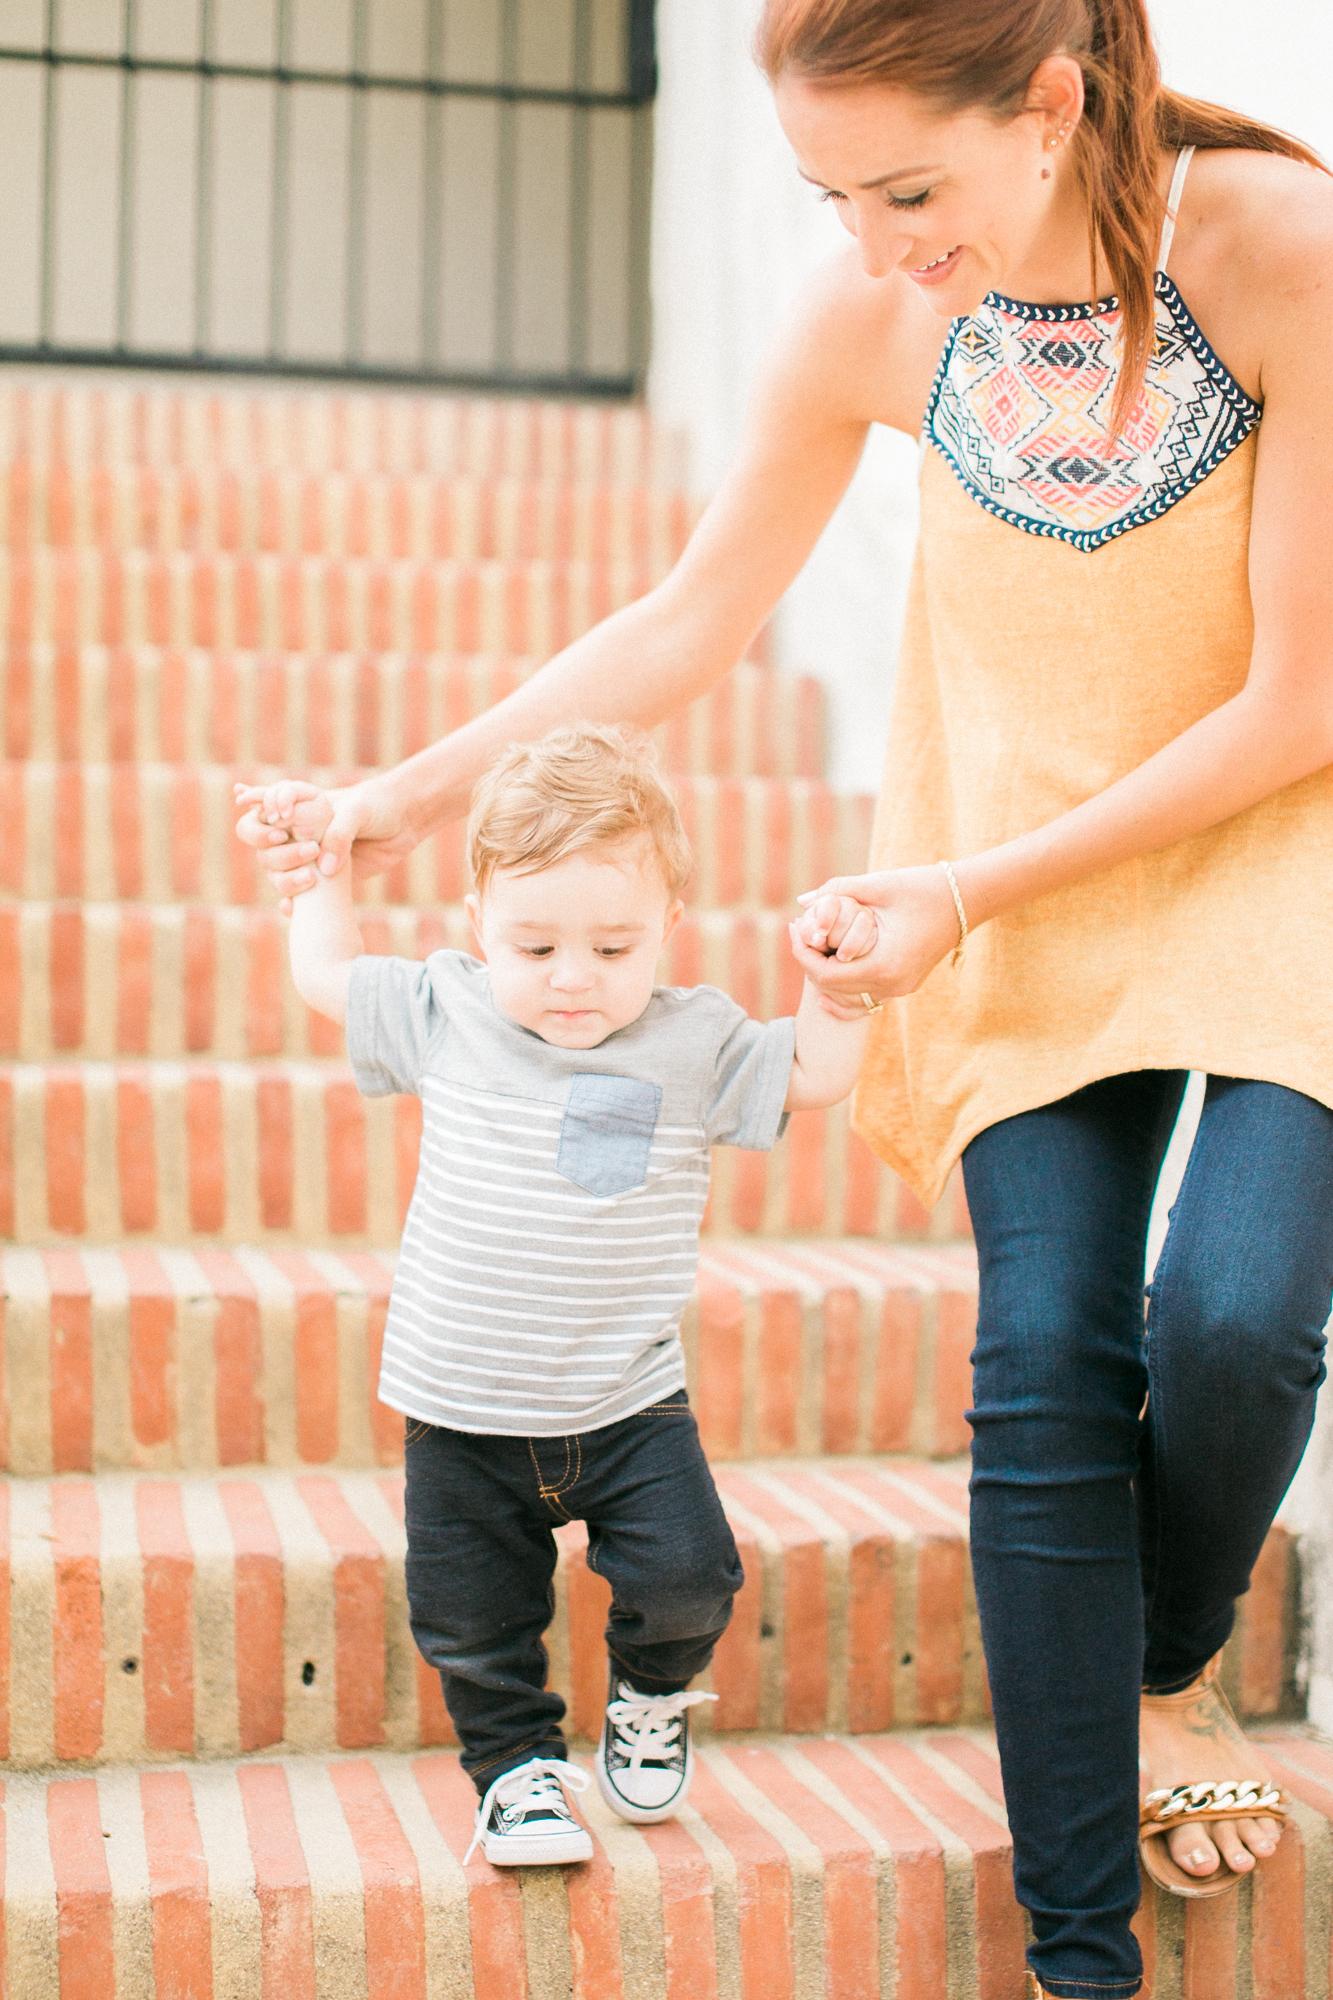 presidio-park-family-photos-11.jpg